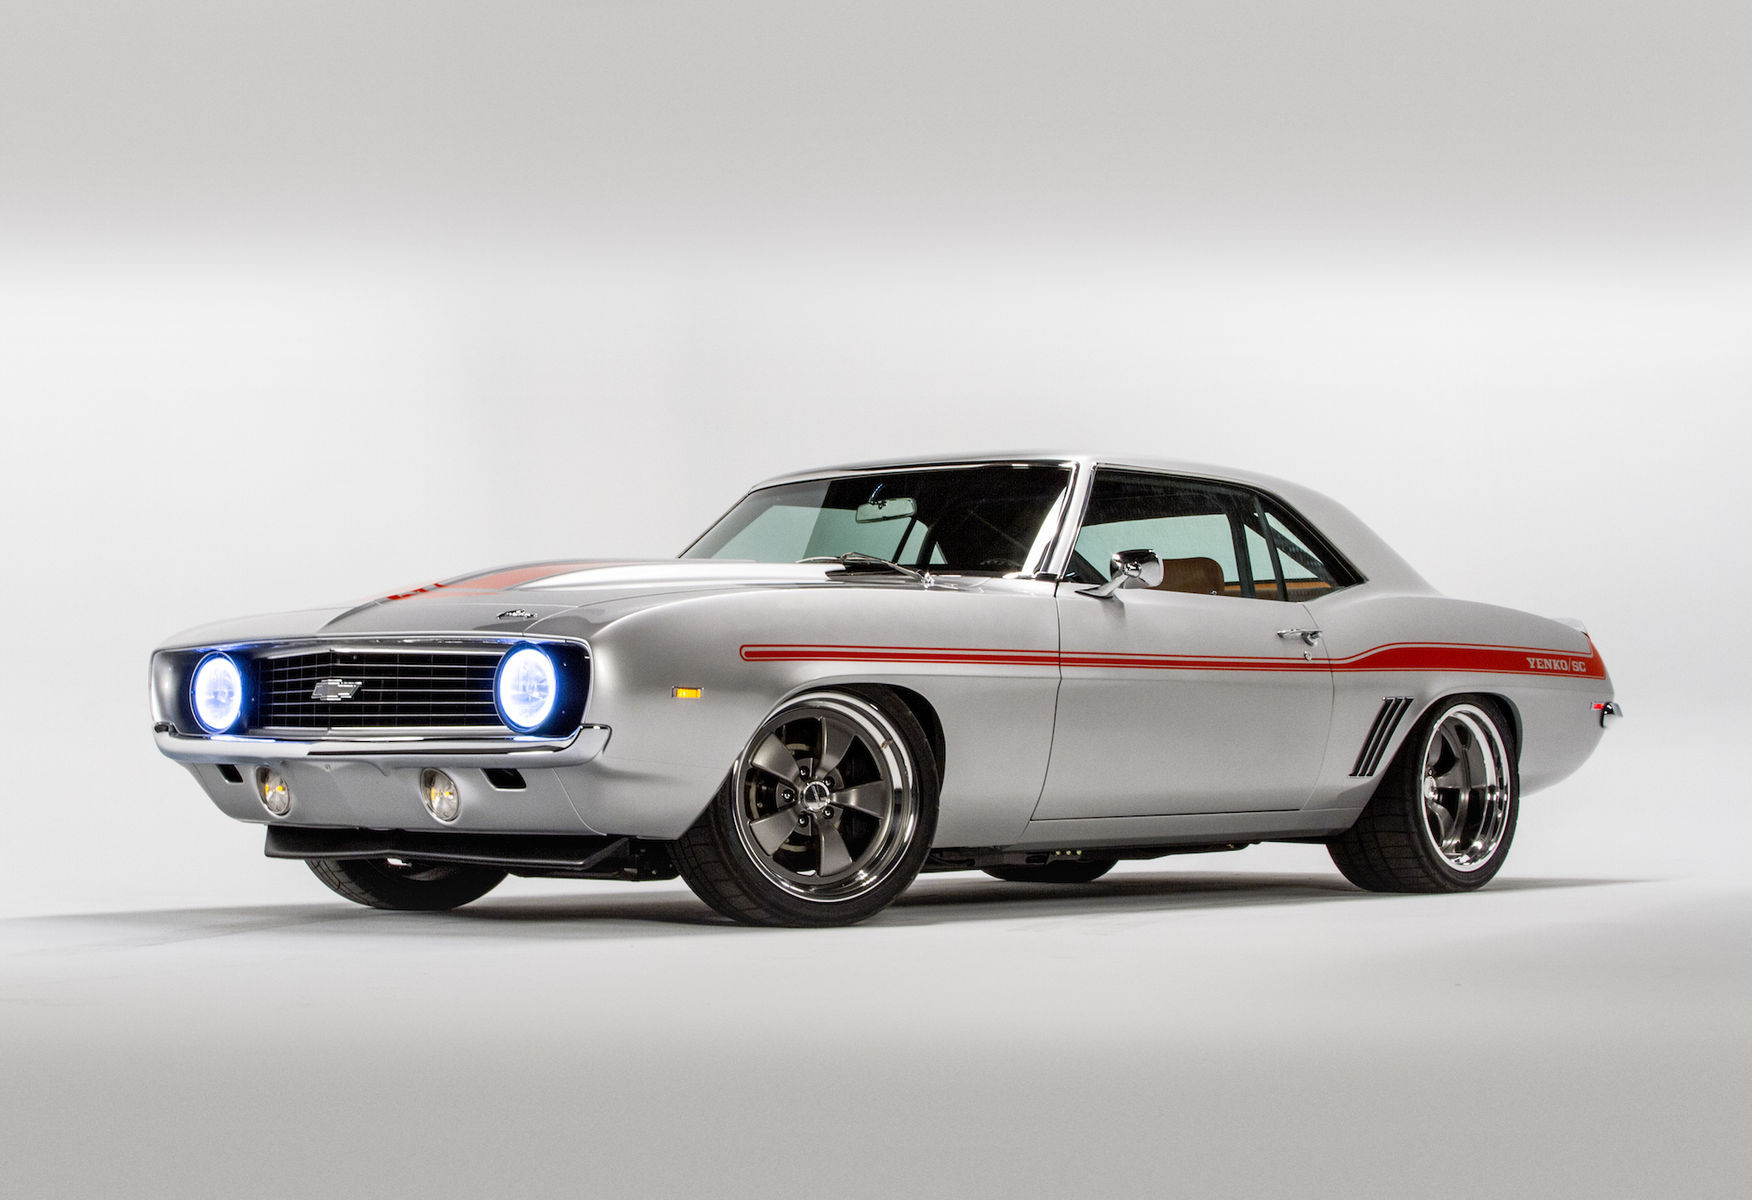 1969 Chevrolet Camaro | Robert Taylor's Detroit Speed-Built '69 Camaro on Forgeline Heritage Series CR3 Wheels